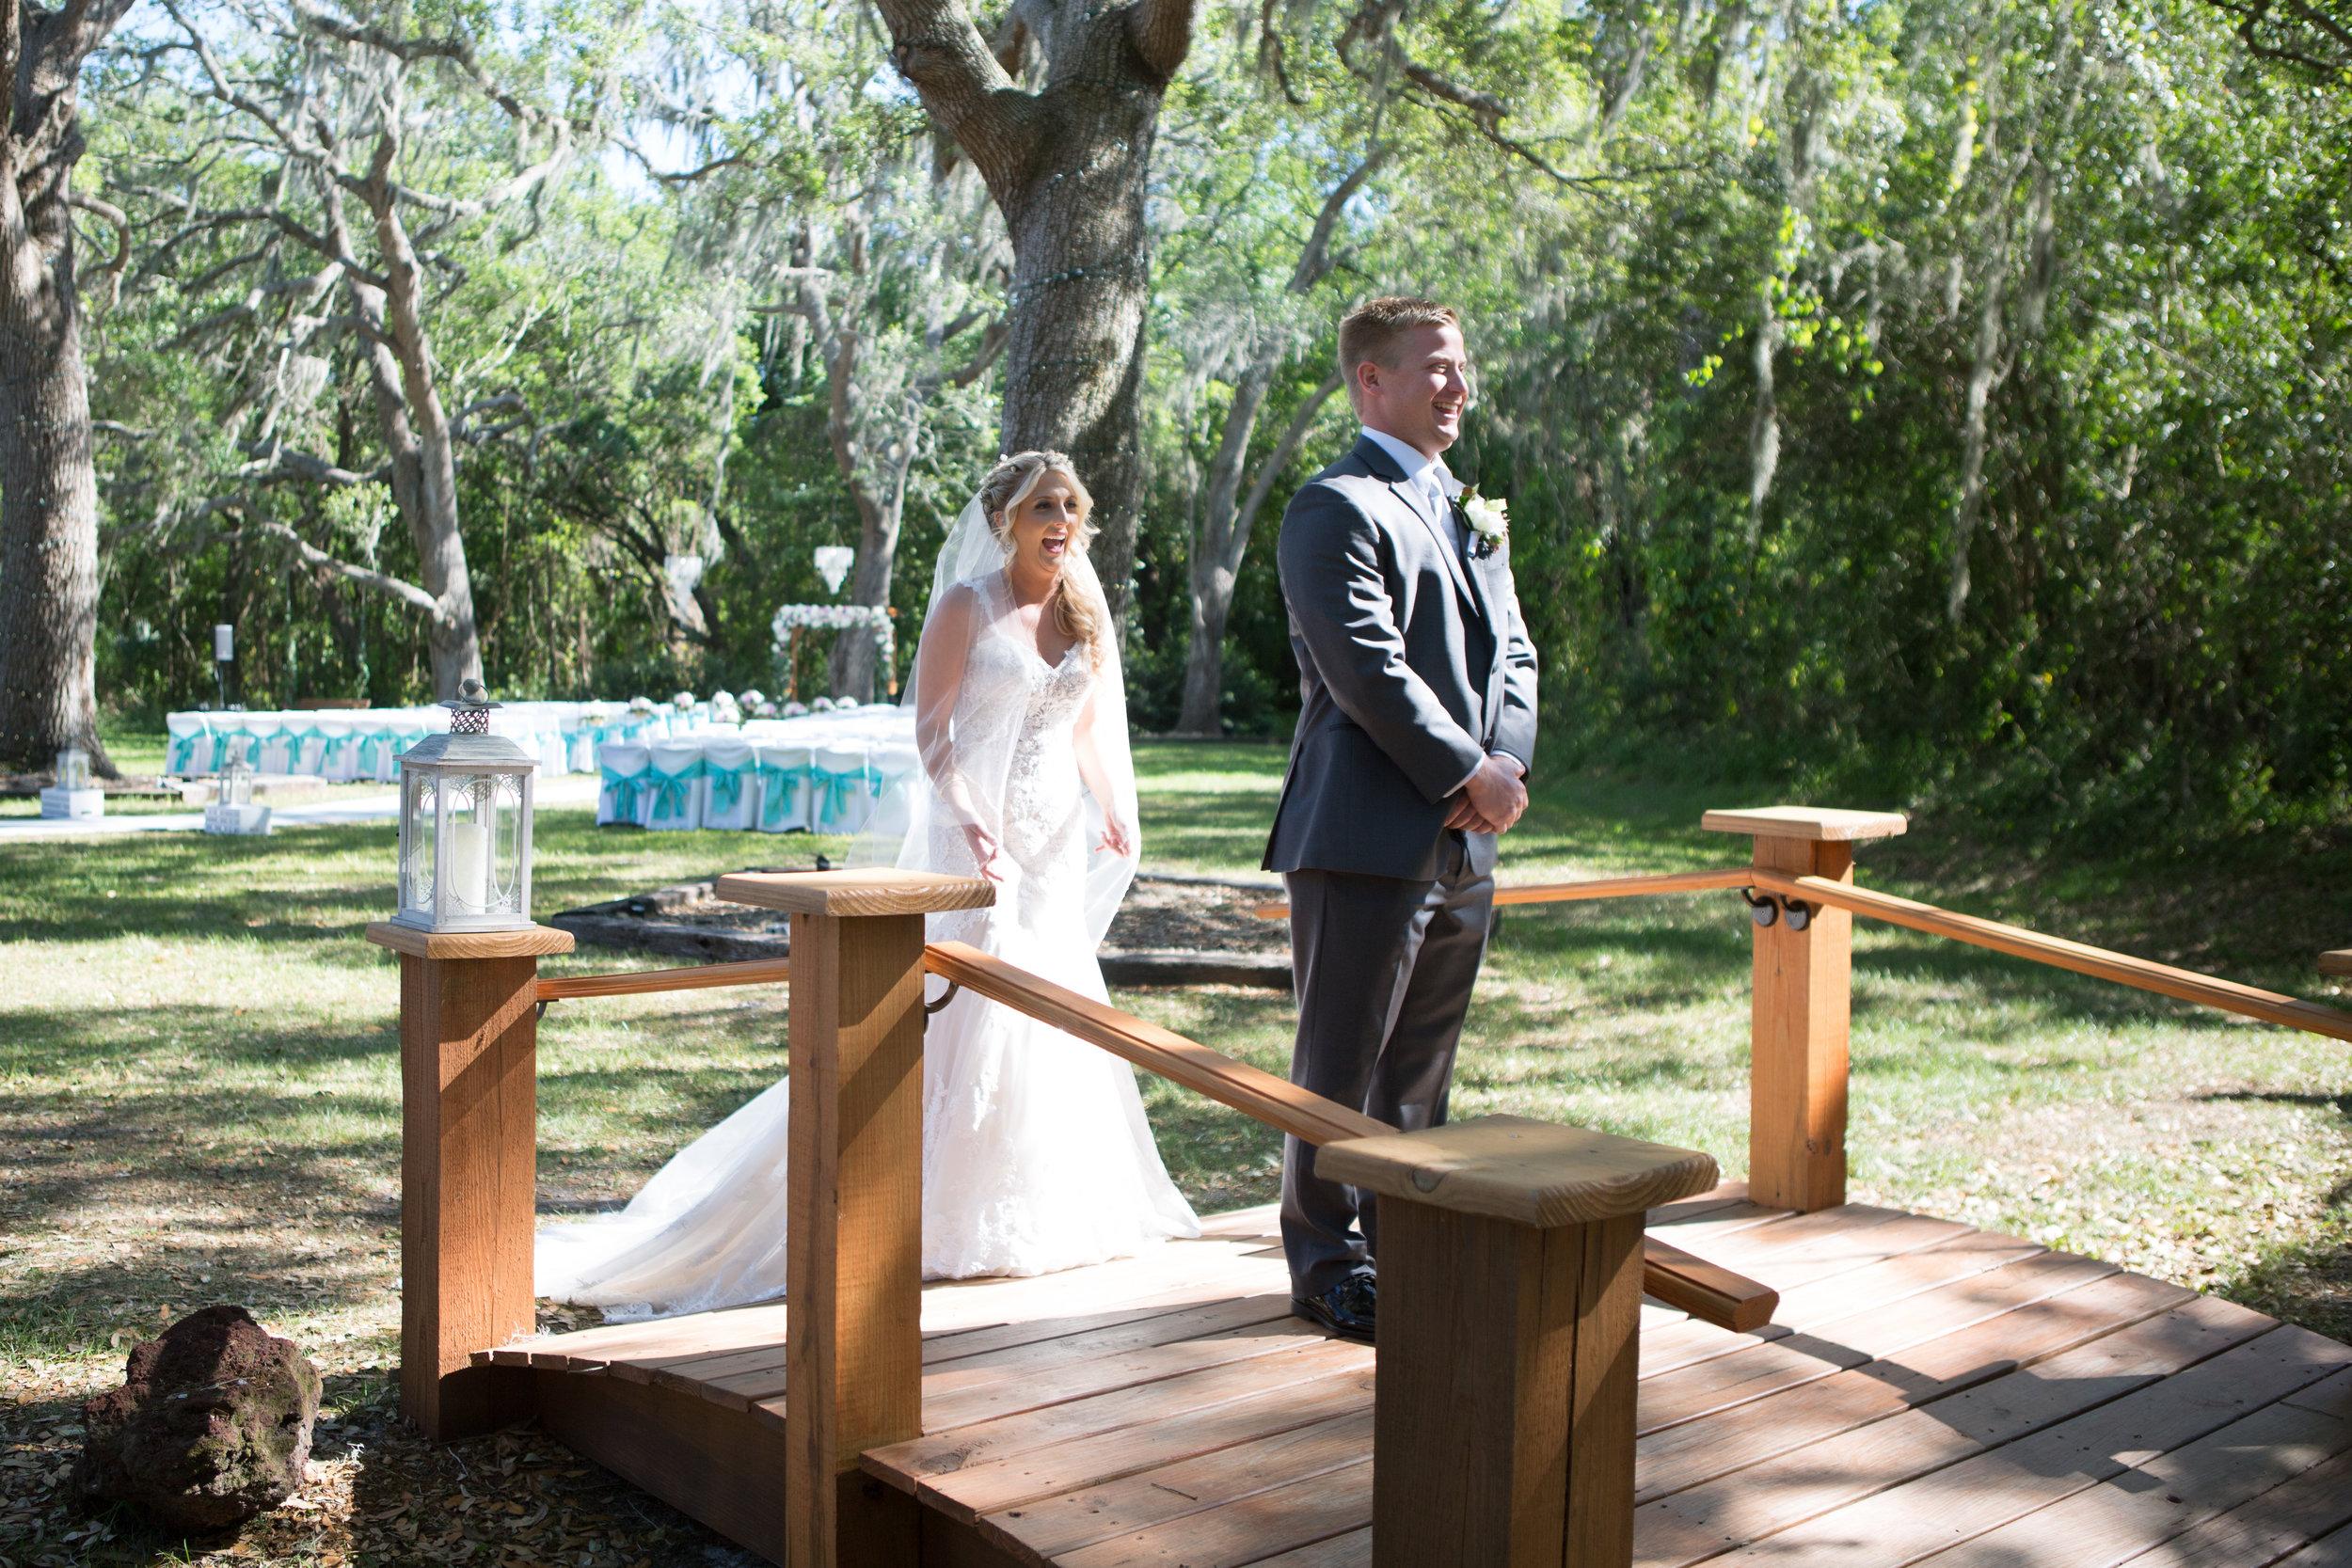 04_08_17_Baker's Ranch_weddings (5).jpg